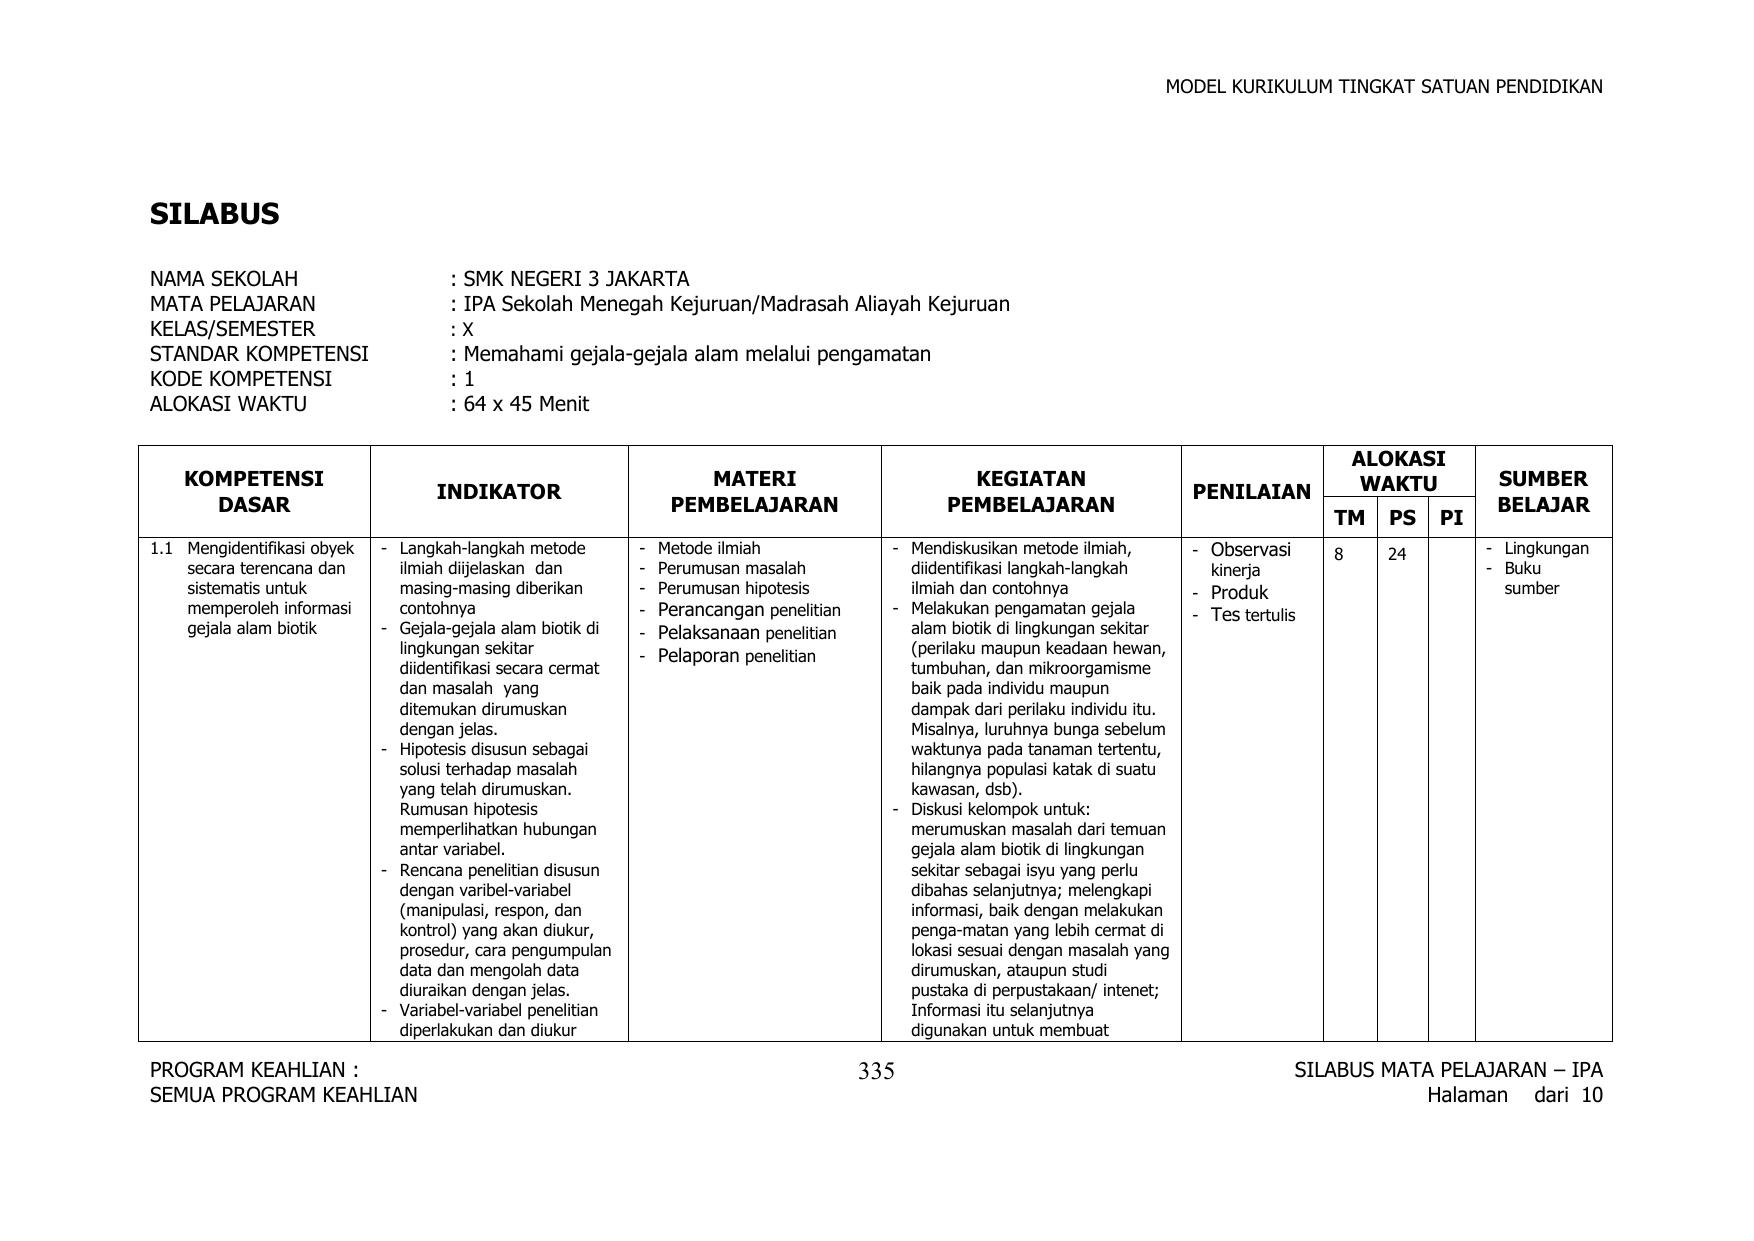 Level Kompetensi Kunci E Learning Sekolah Menengah Kejuruan